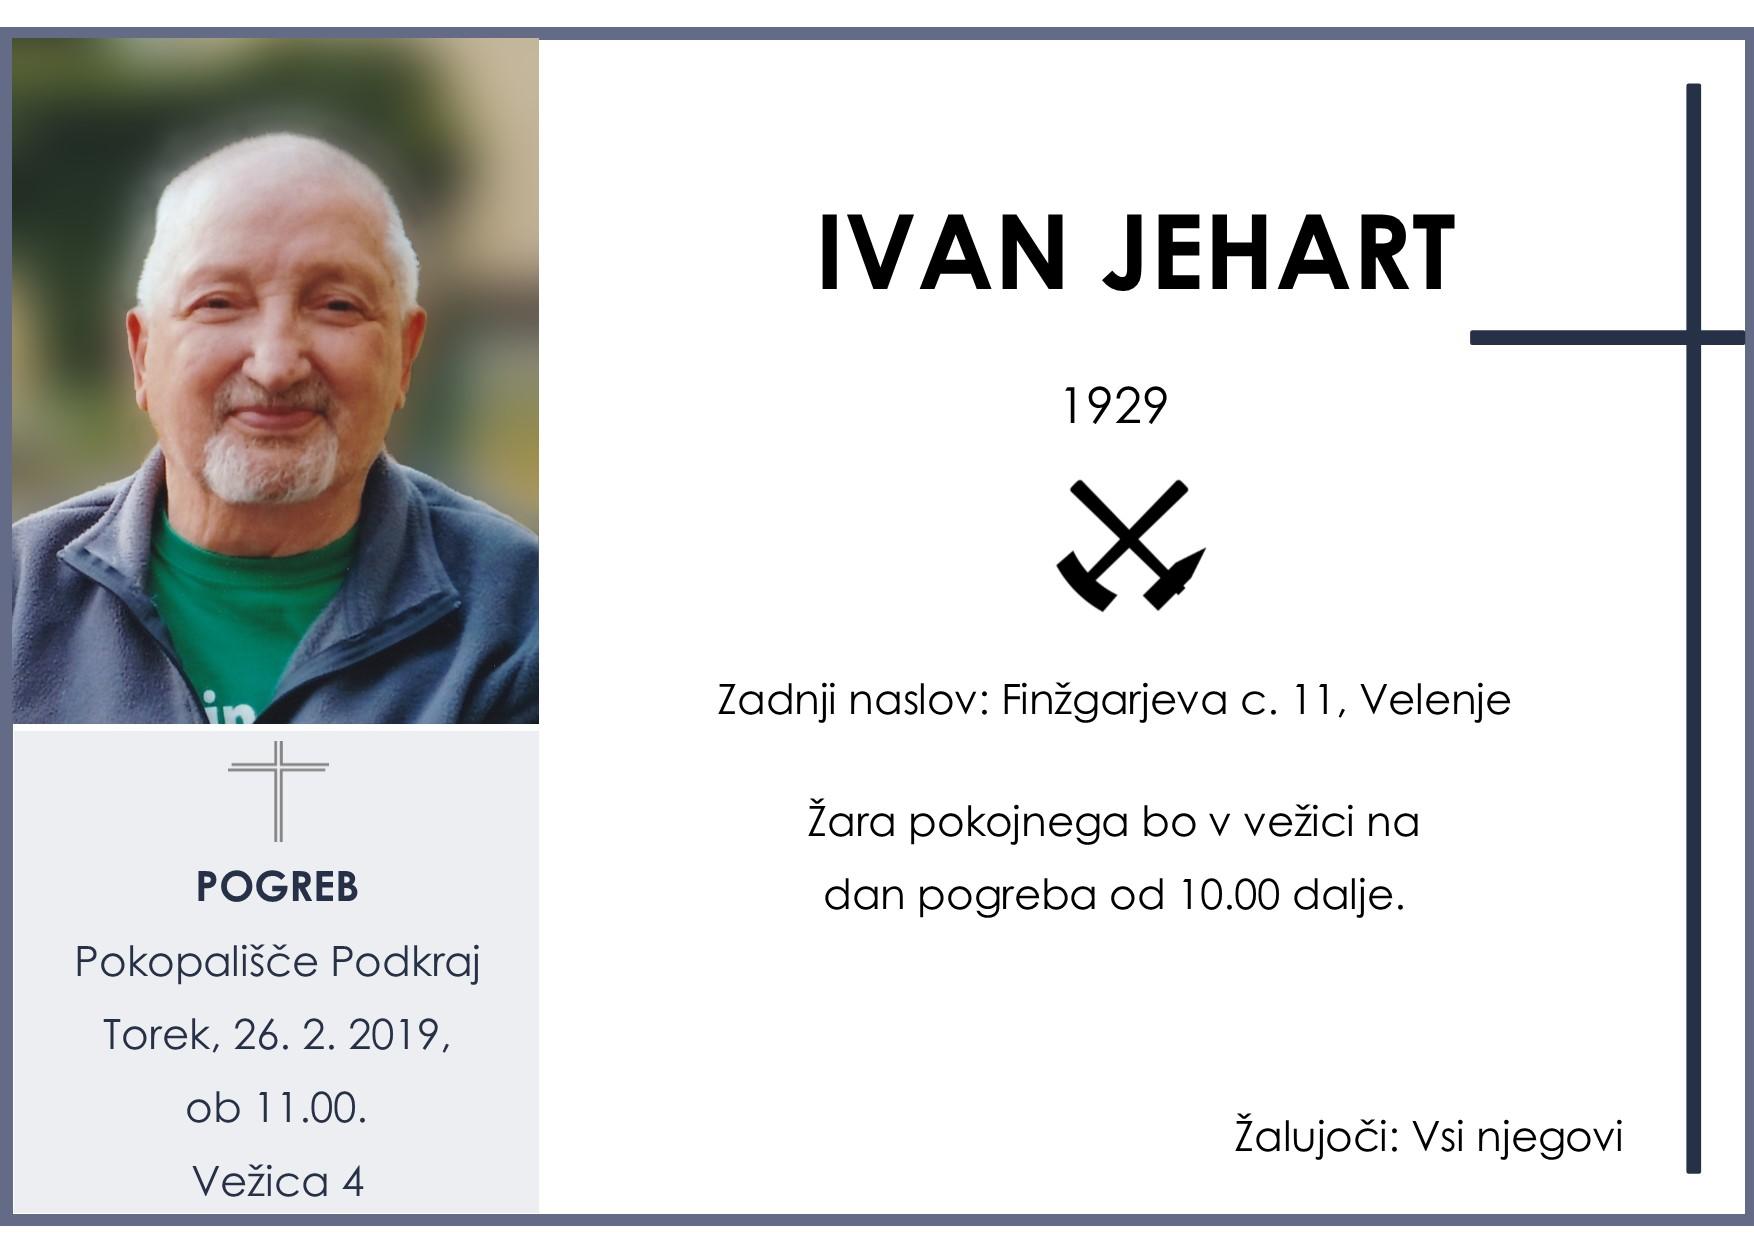 IVAN JEHART, 26. 02. 2019, Podkraj